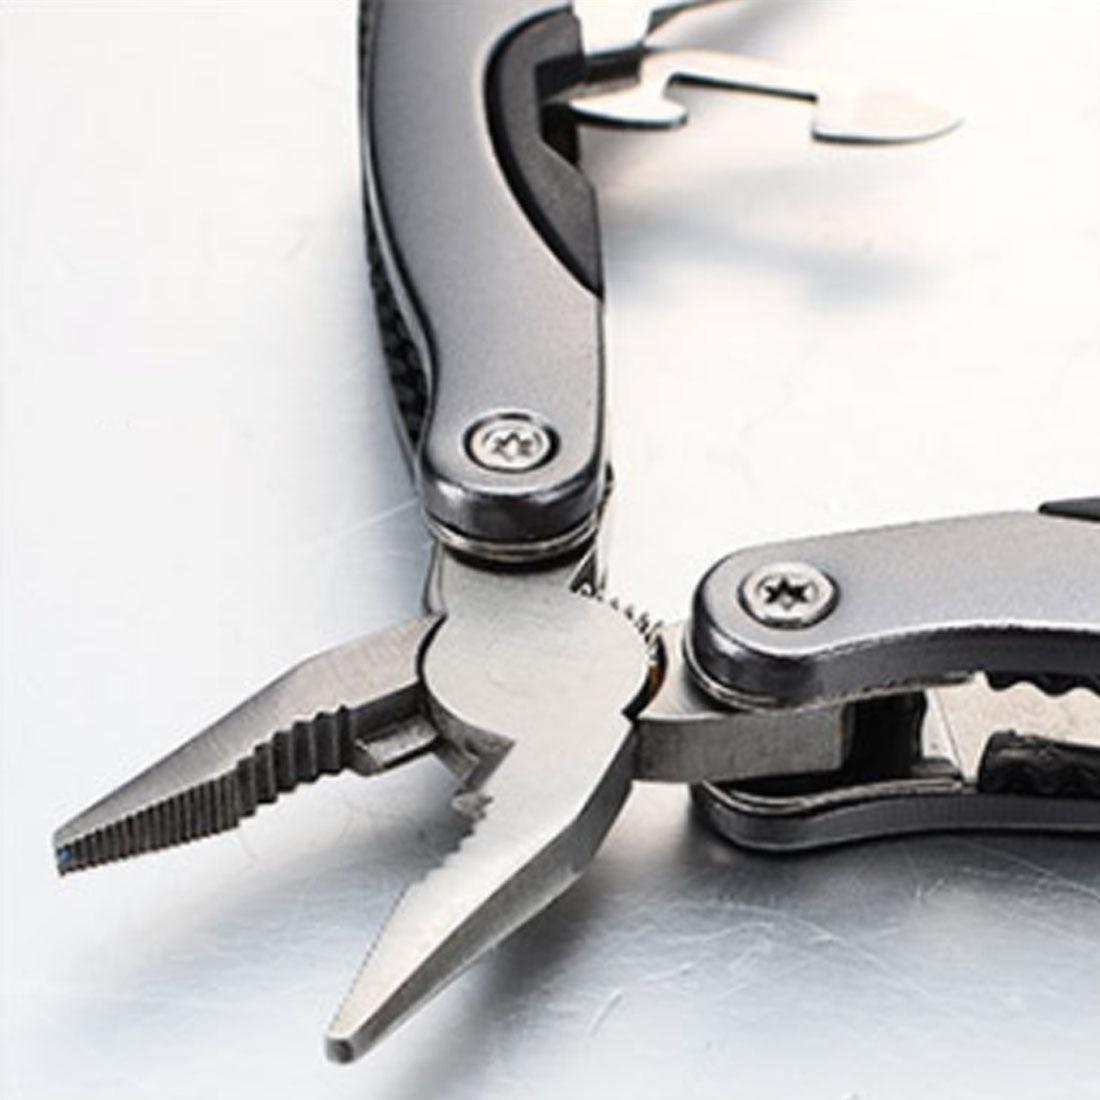 Pro Outdoor Multitool Pliers Serrated Knife Jaw Hand Tools+Screwdriver+Pliers+Knife Multi - purpose tool set Survival Gear